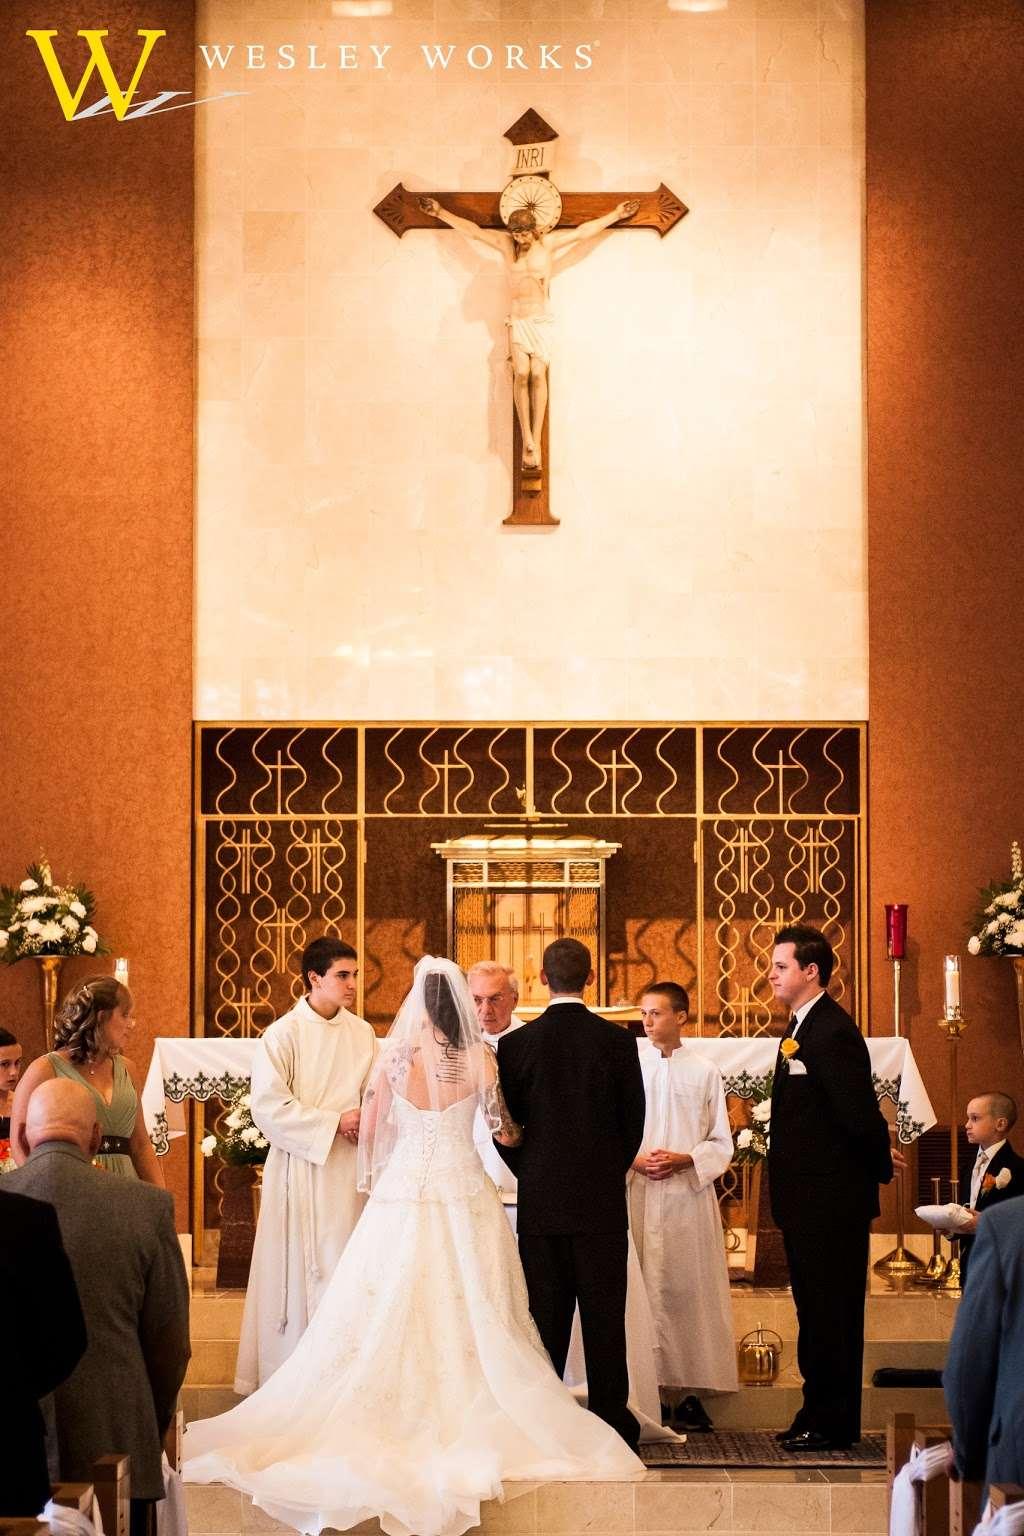 Holy Family Church - church  | Photo 3 of 5 | Address: 410 W Center St, Nazareth, PA 18064, USA | Phone: (610) 759-0870